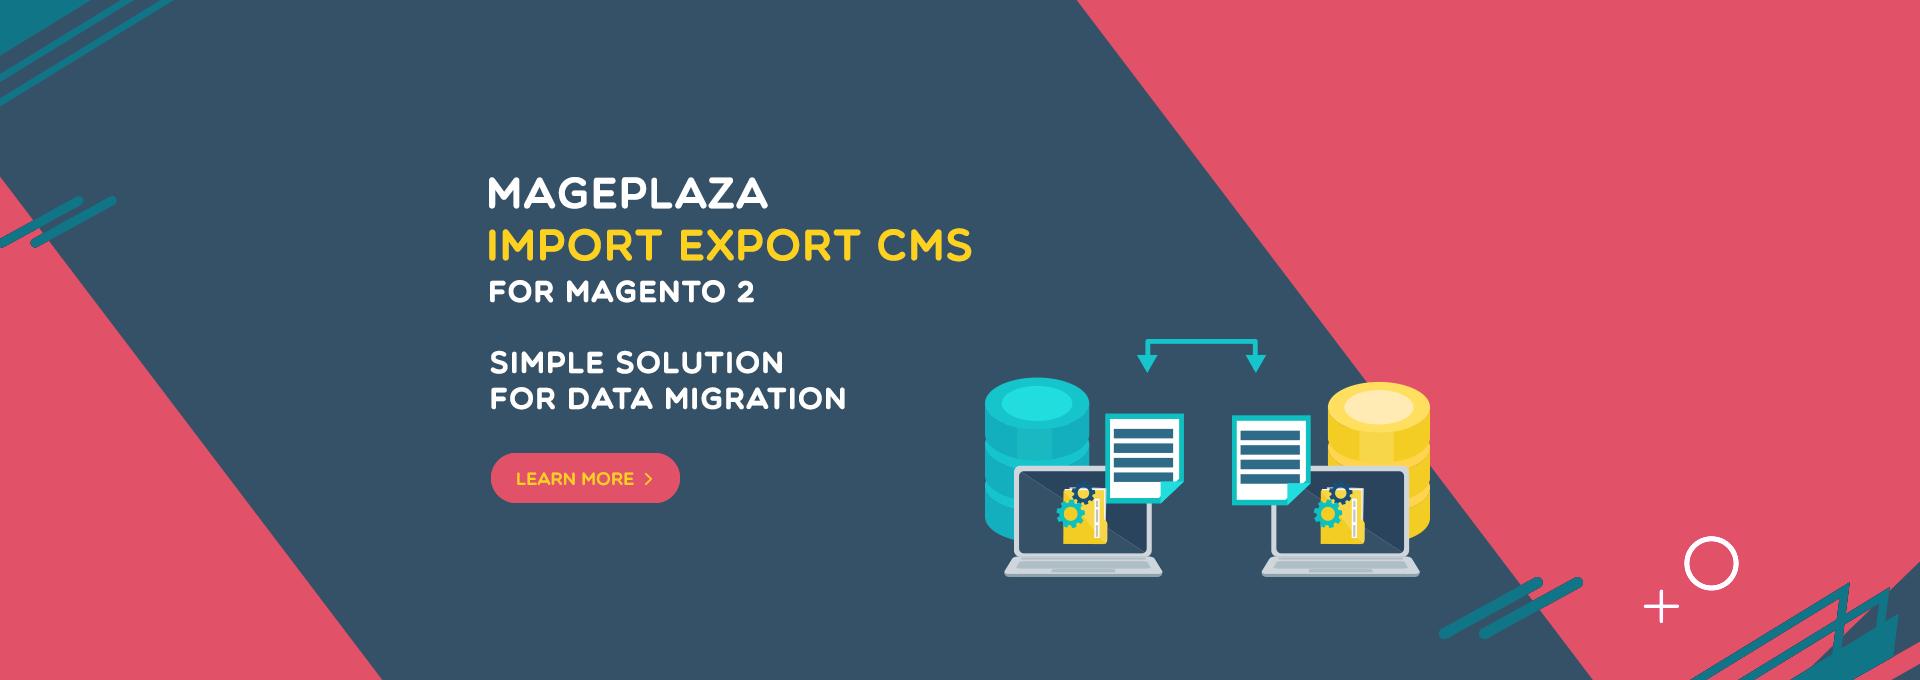 magento 2 import export cms